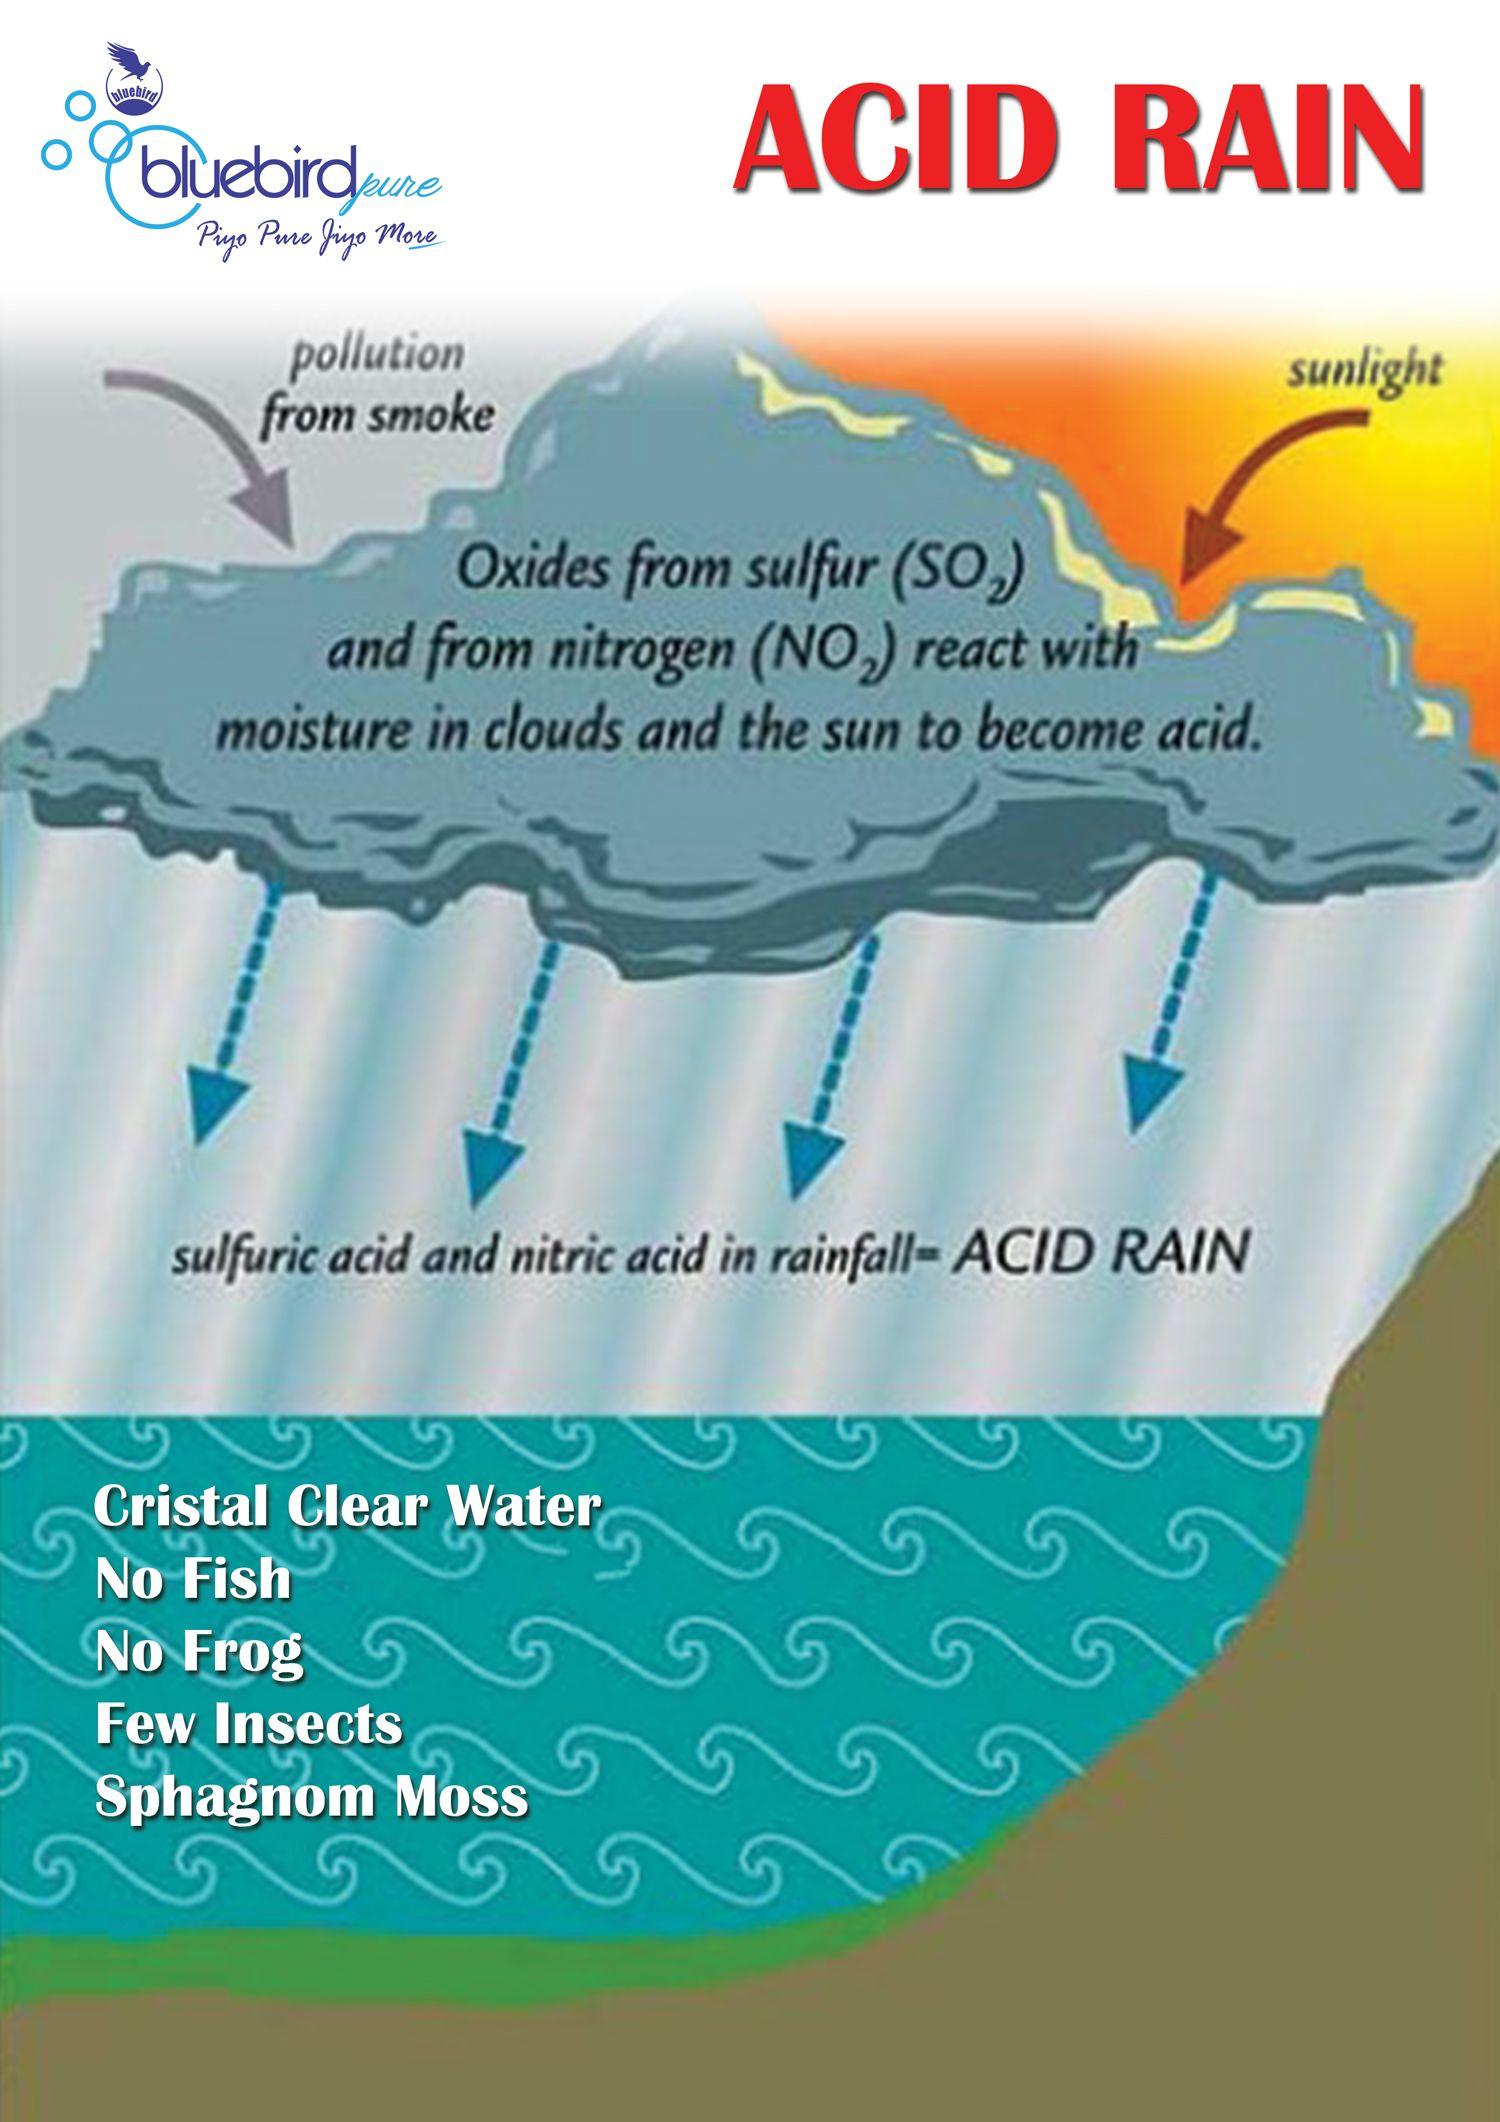 hight resolution of acid rain easy diagram wiring diagram autovehicle acid rain easy diagram